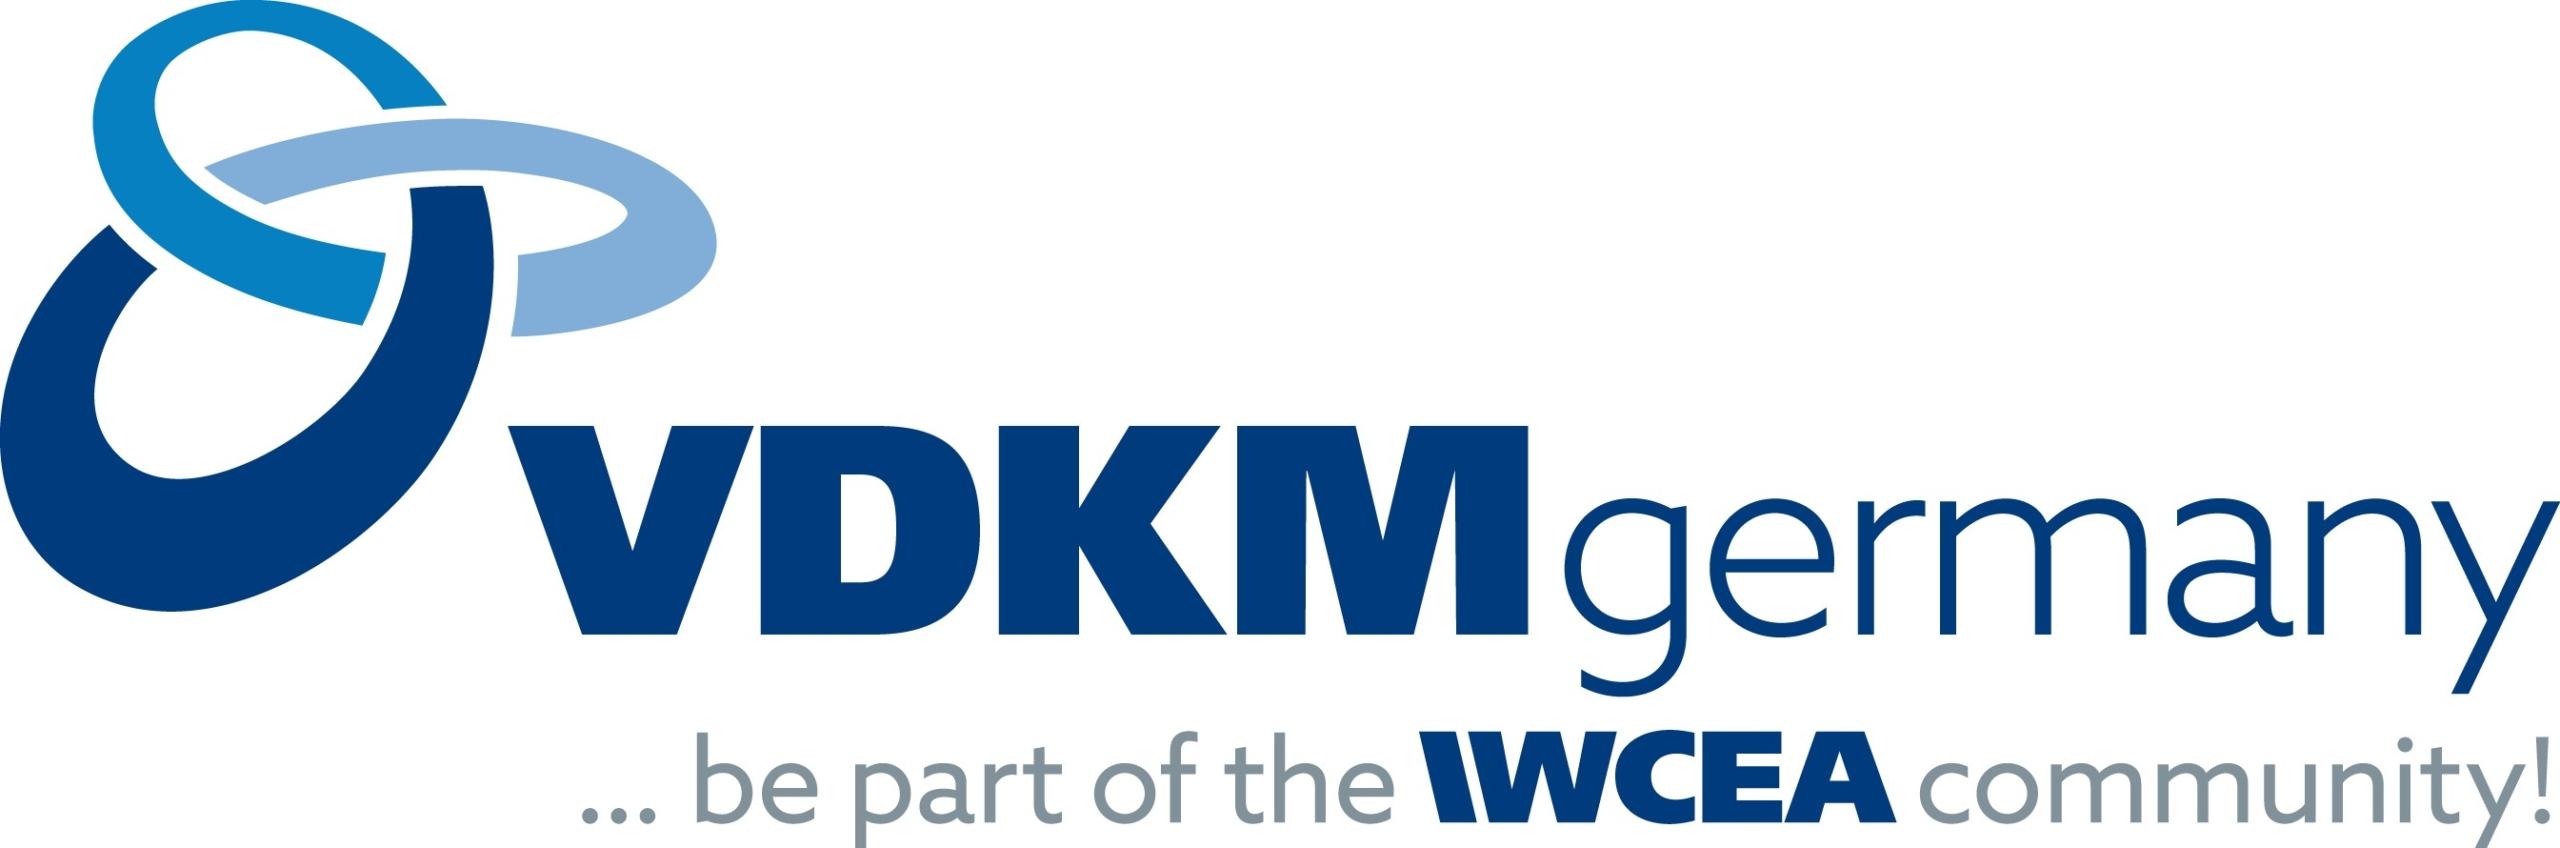 VDKM Logo